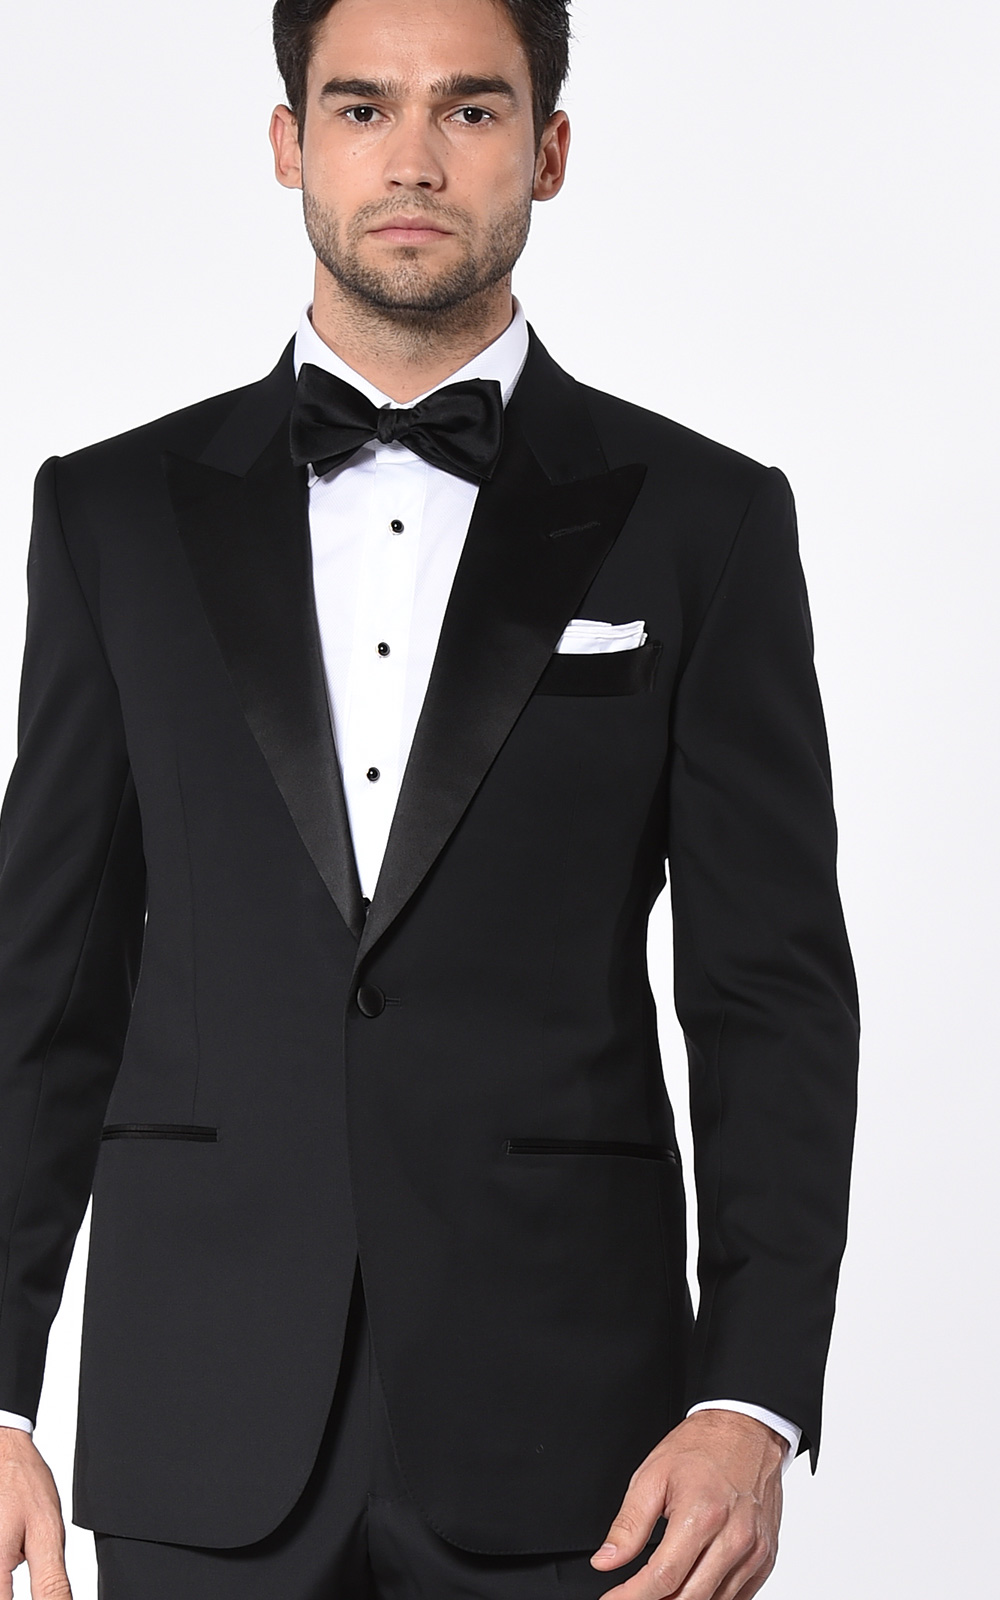 Black Classic Satin Bespoke Tuxedo